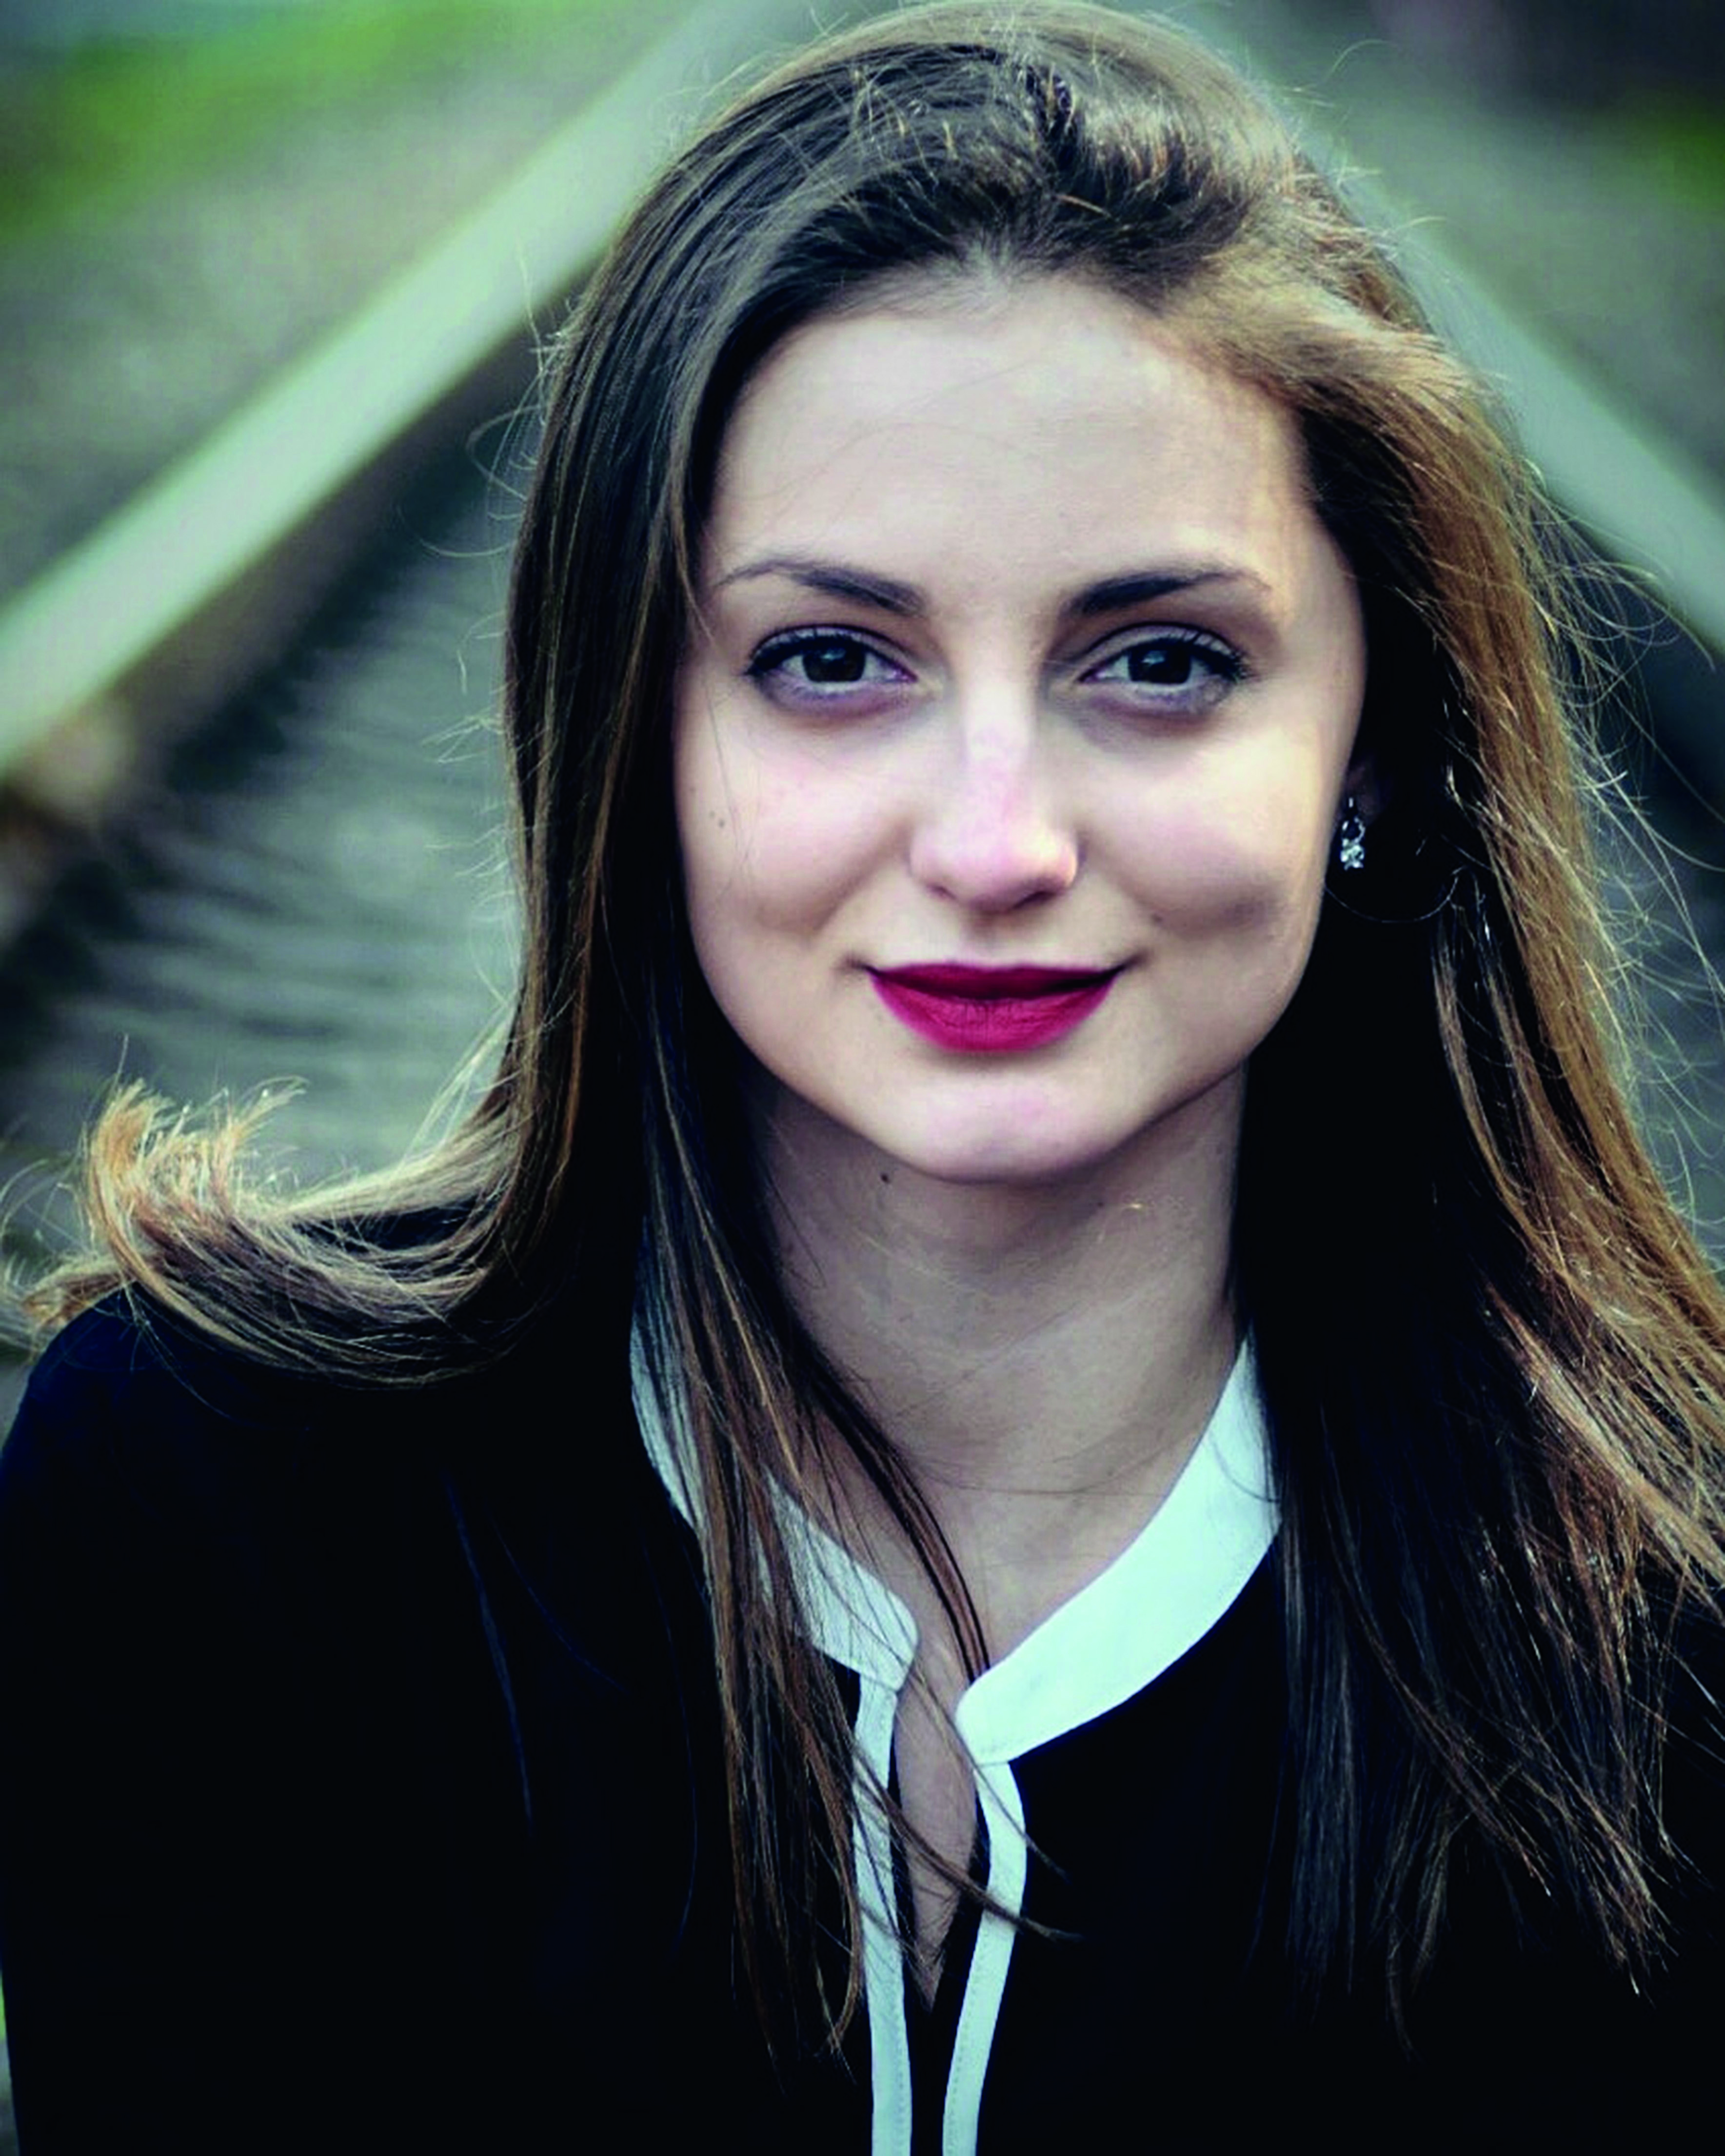 Rebeka Stojkoska